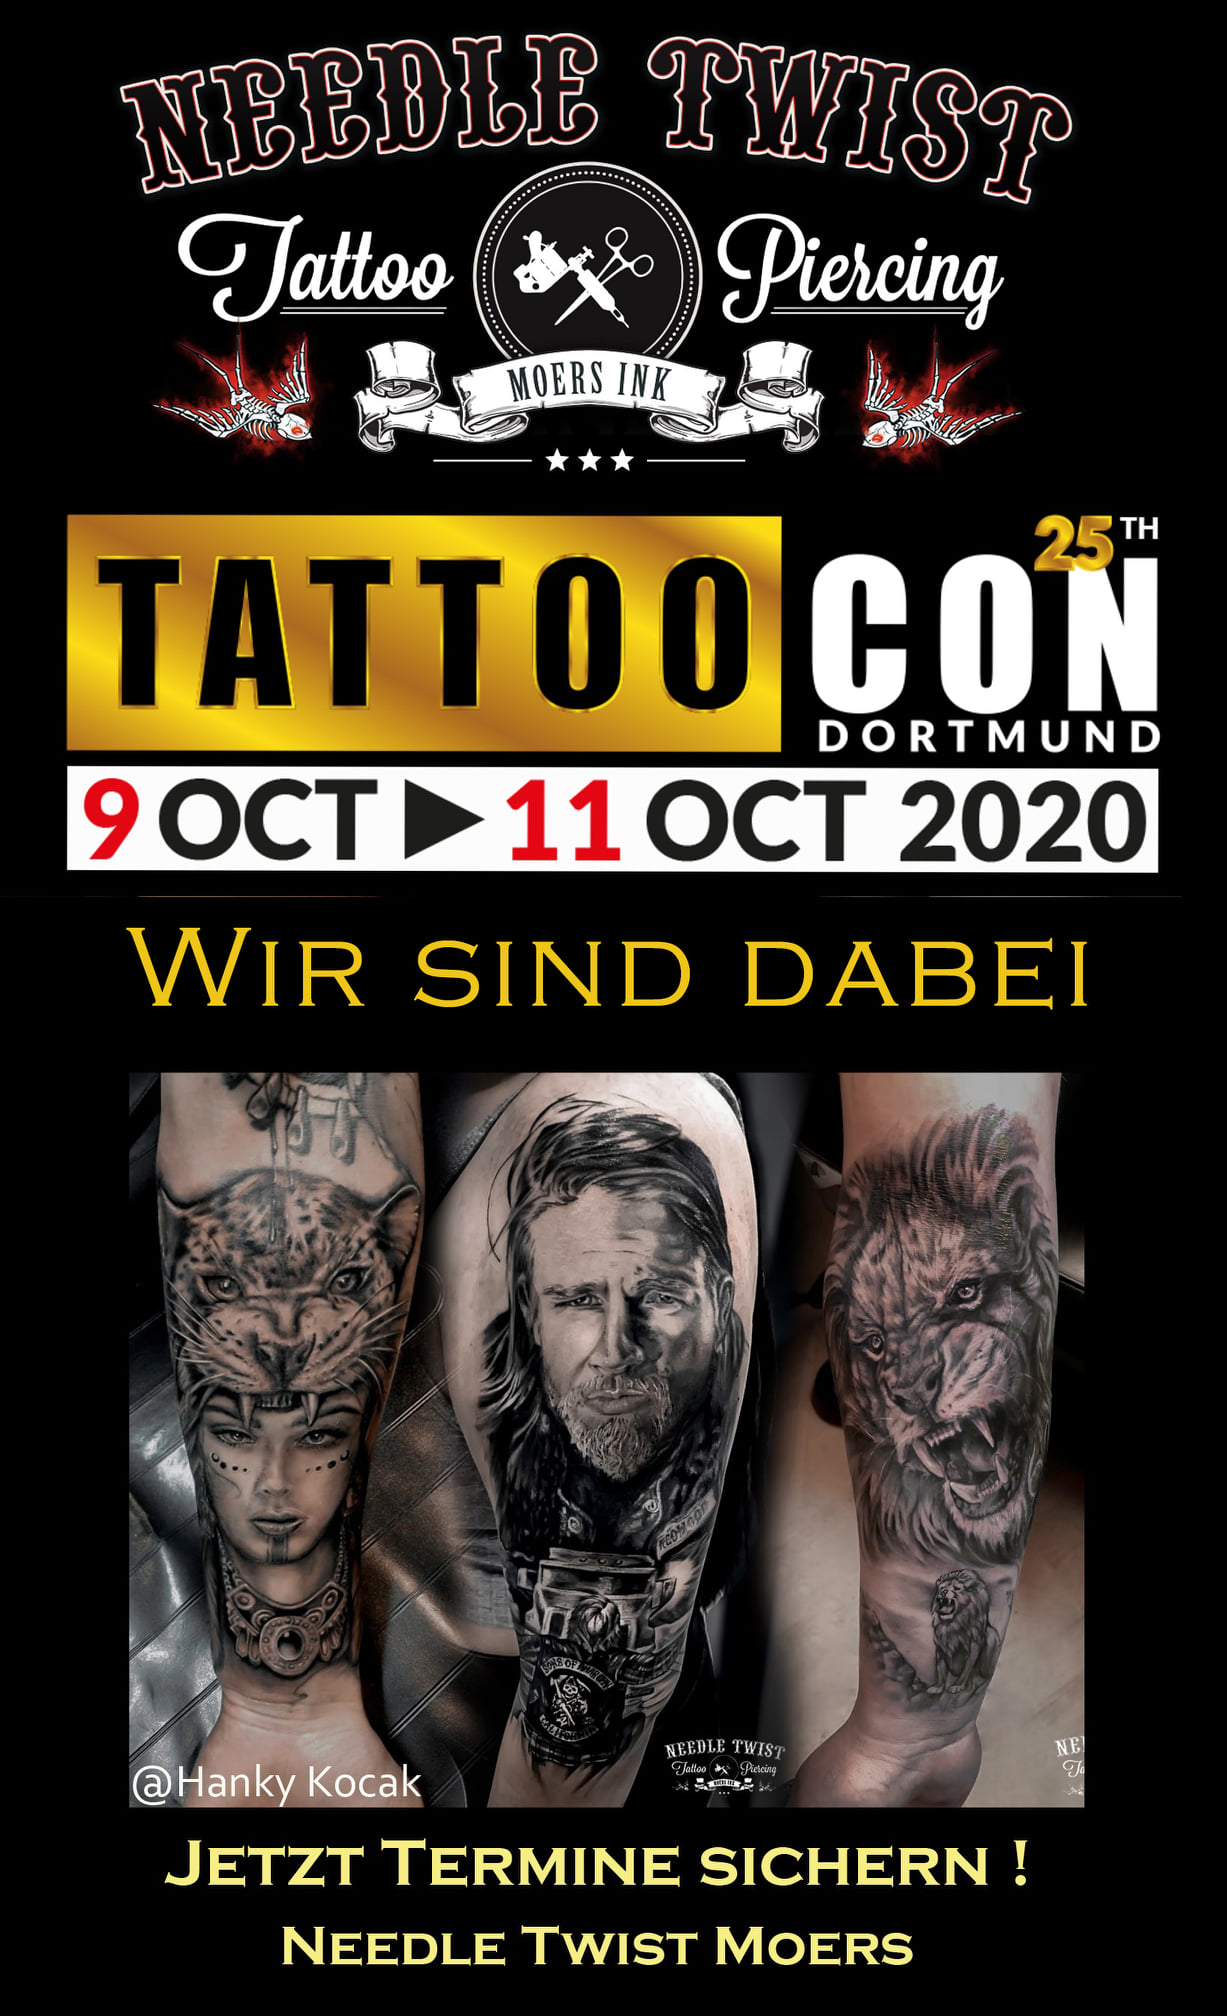 Tattoo Show Dortmund